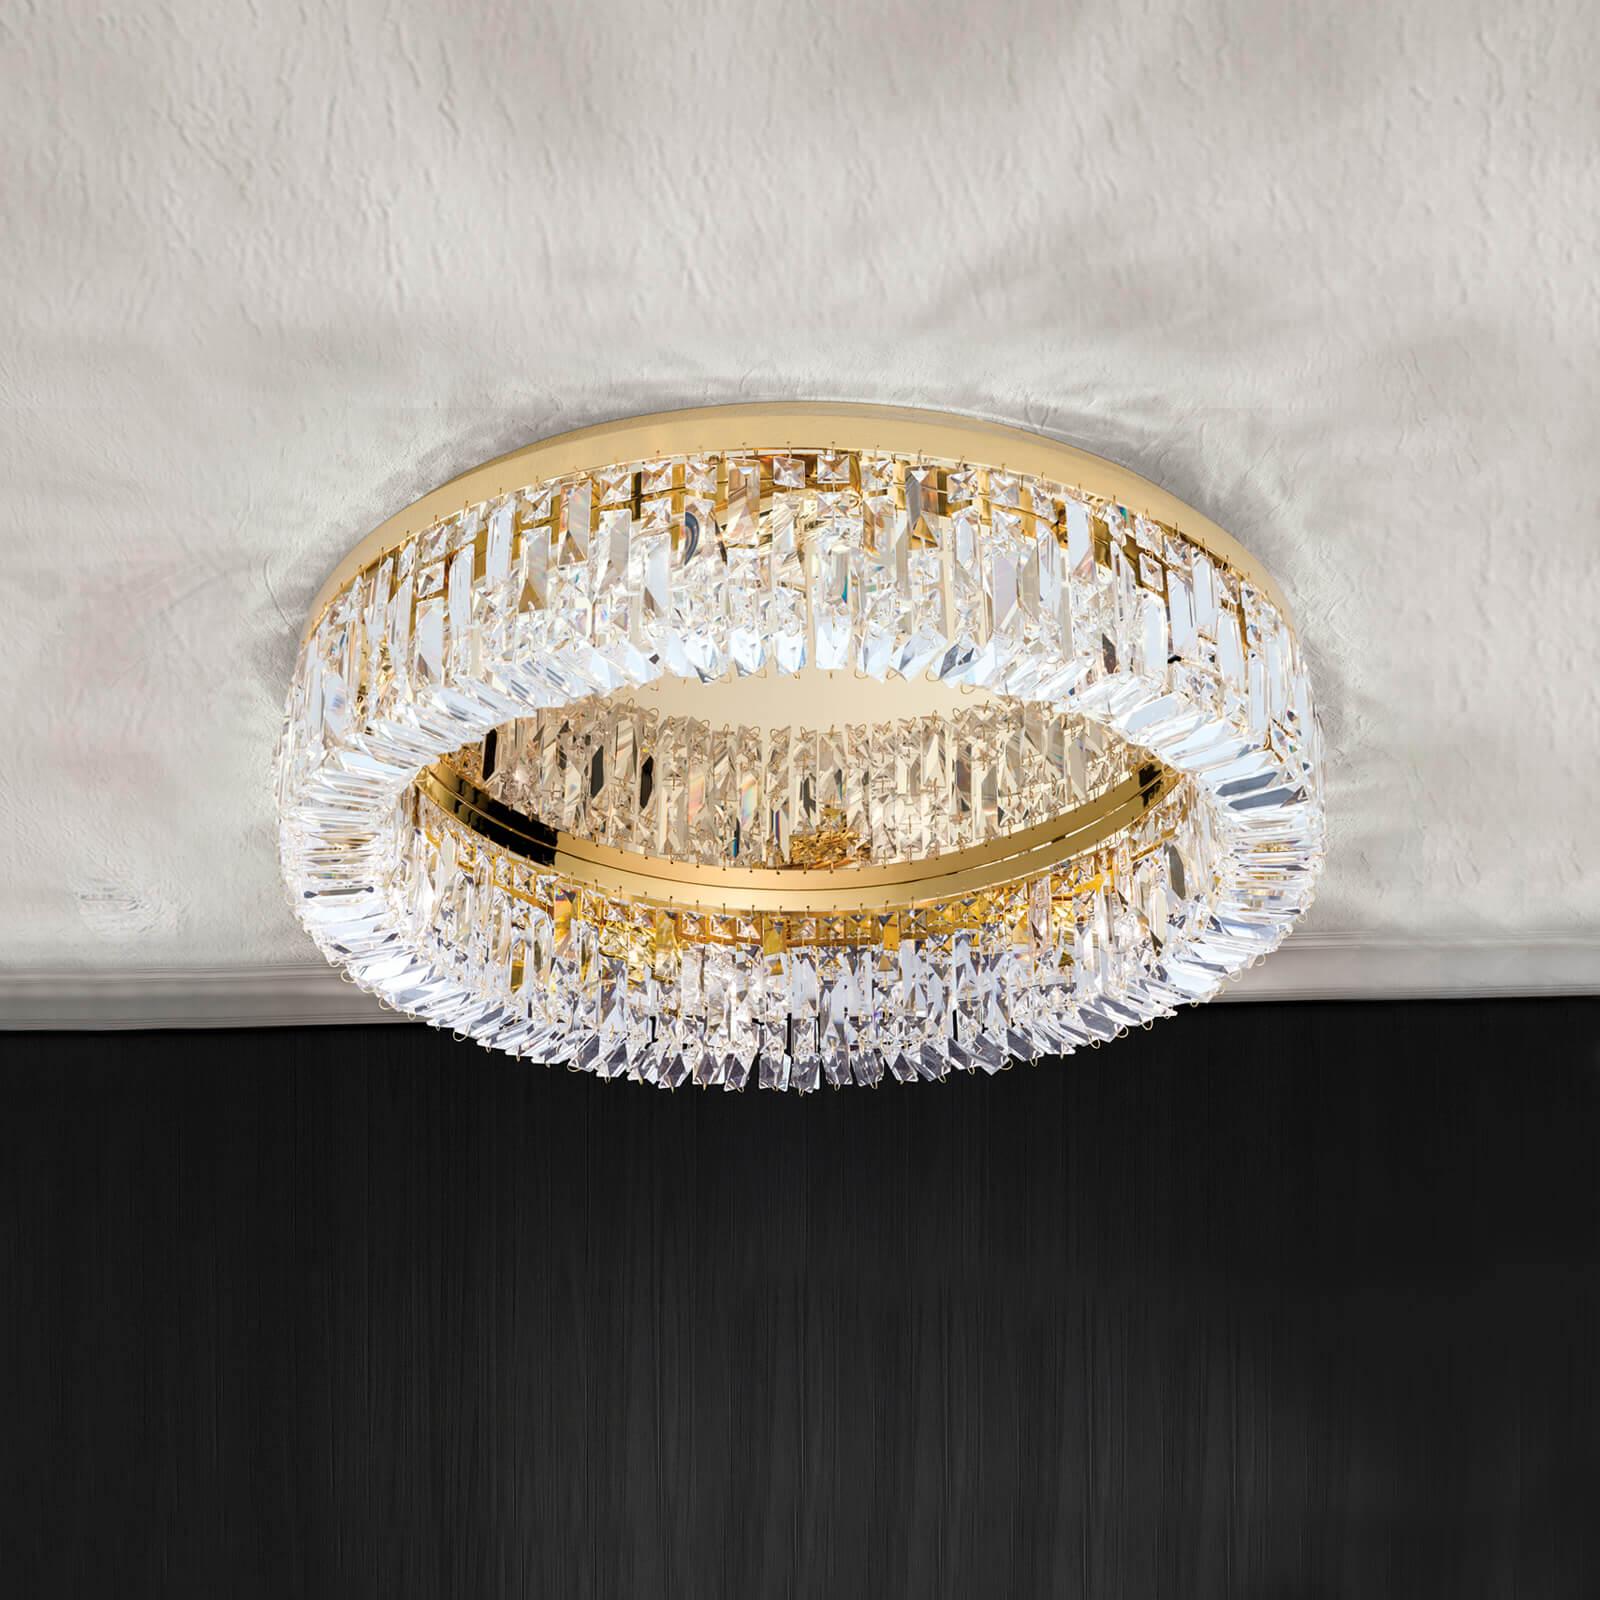 Kristall-Deckenlampe Ring - 59 cm